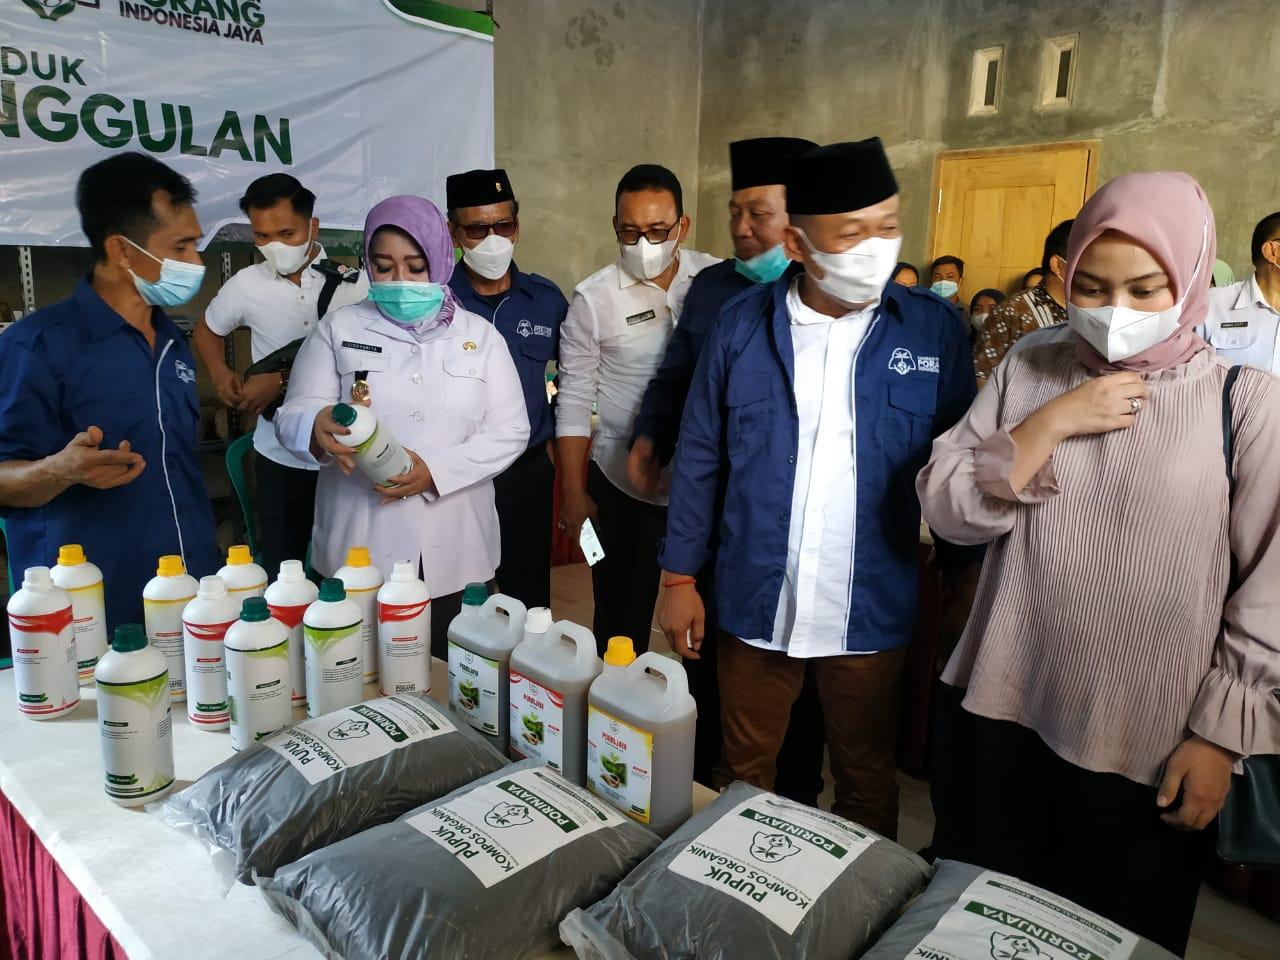 Produk pupuk organik olahan para peternak sapi perah Pudak dan SMK 1 Pemda ditinjau Bupati dan Wakil Bupati Ponorogo